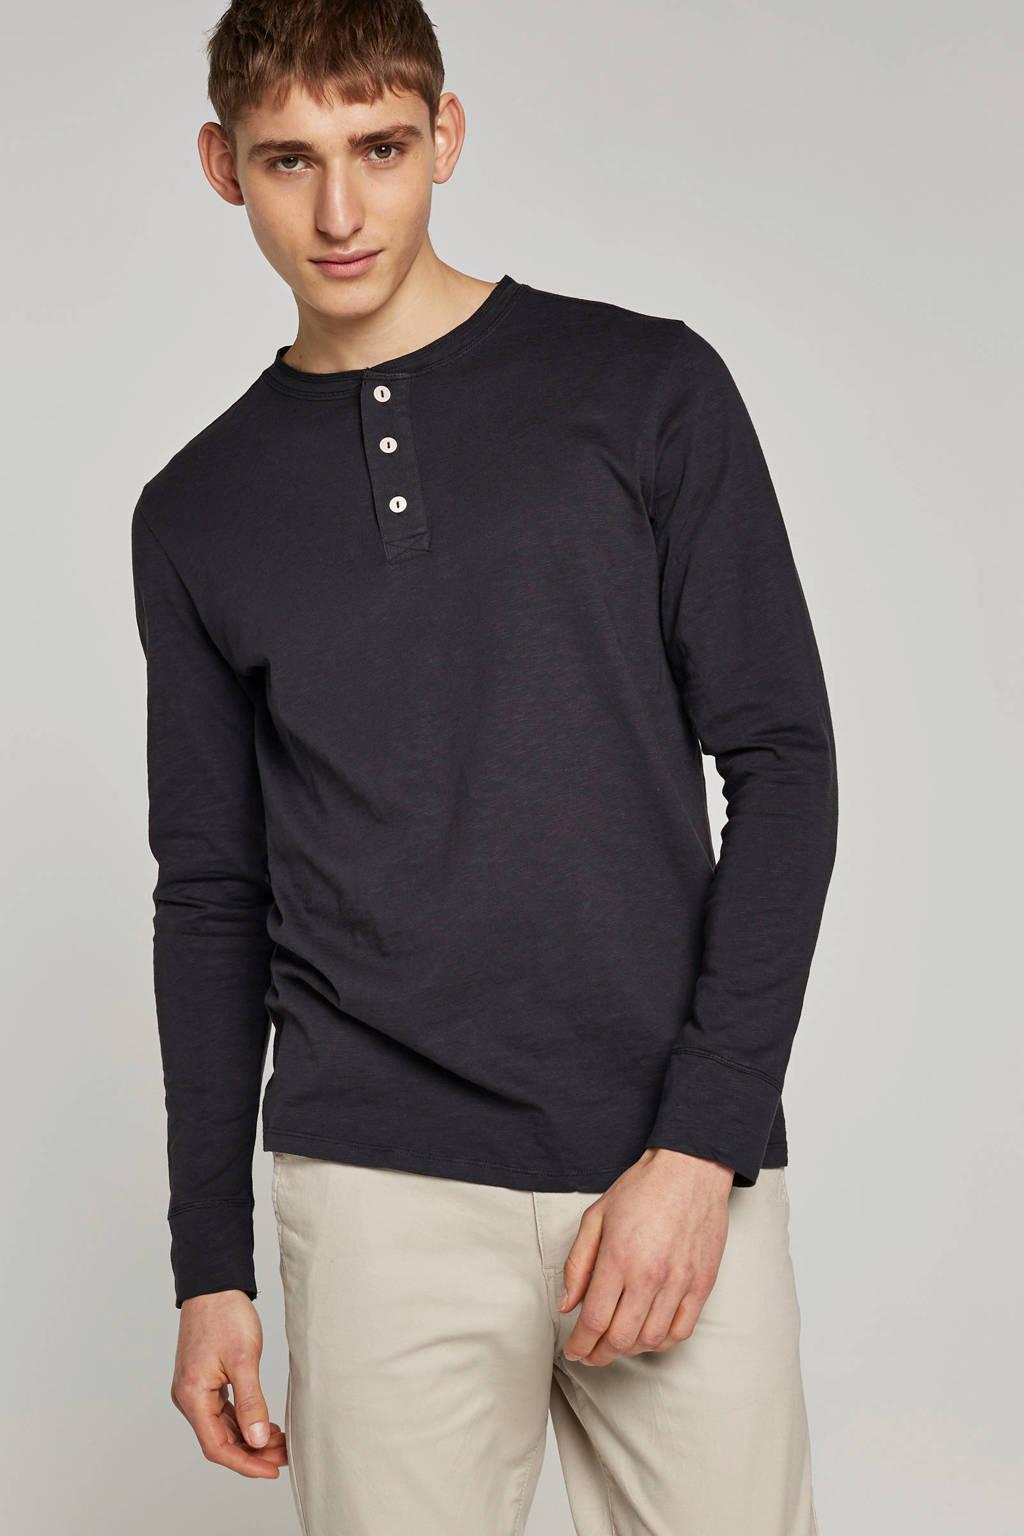 SELECTED HOMME T-shirt lange mouw, Zwart